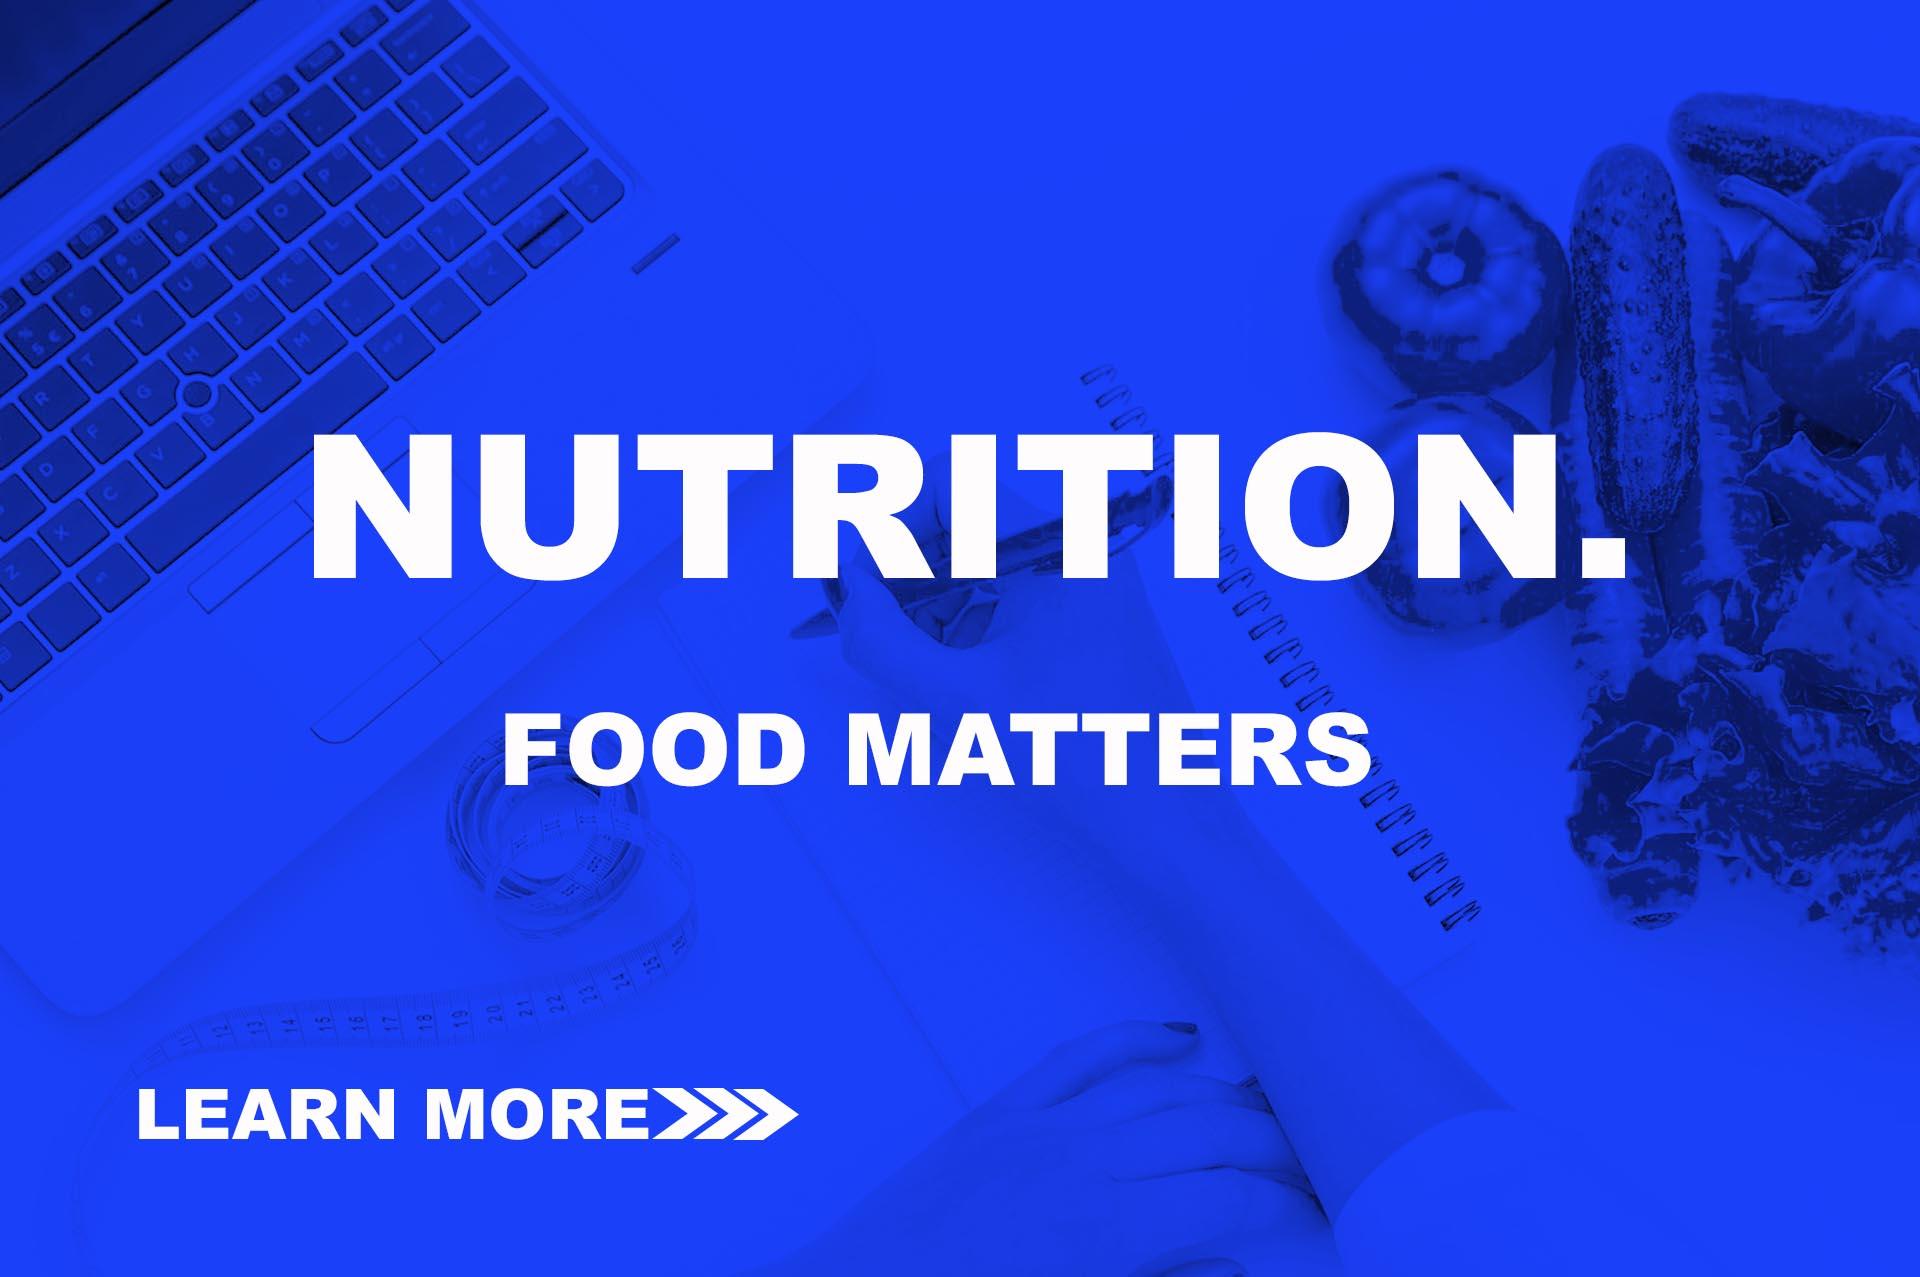 nutritionbox